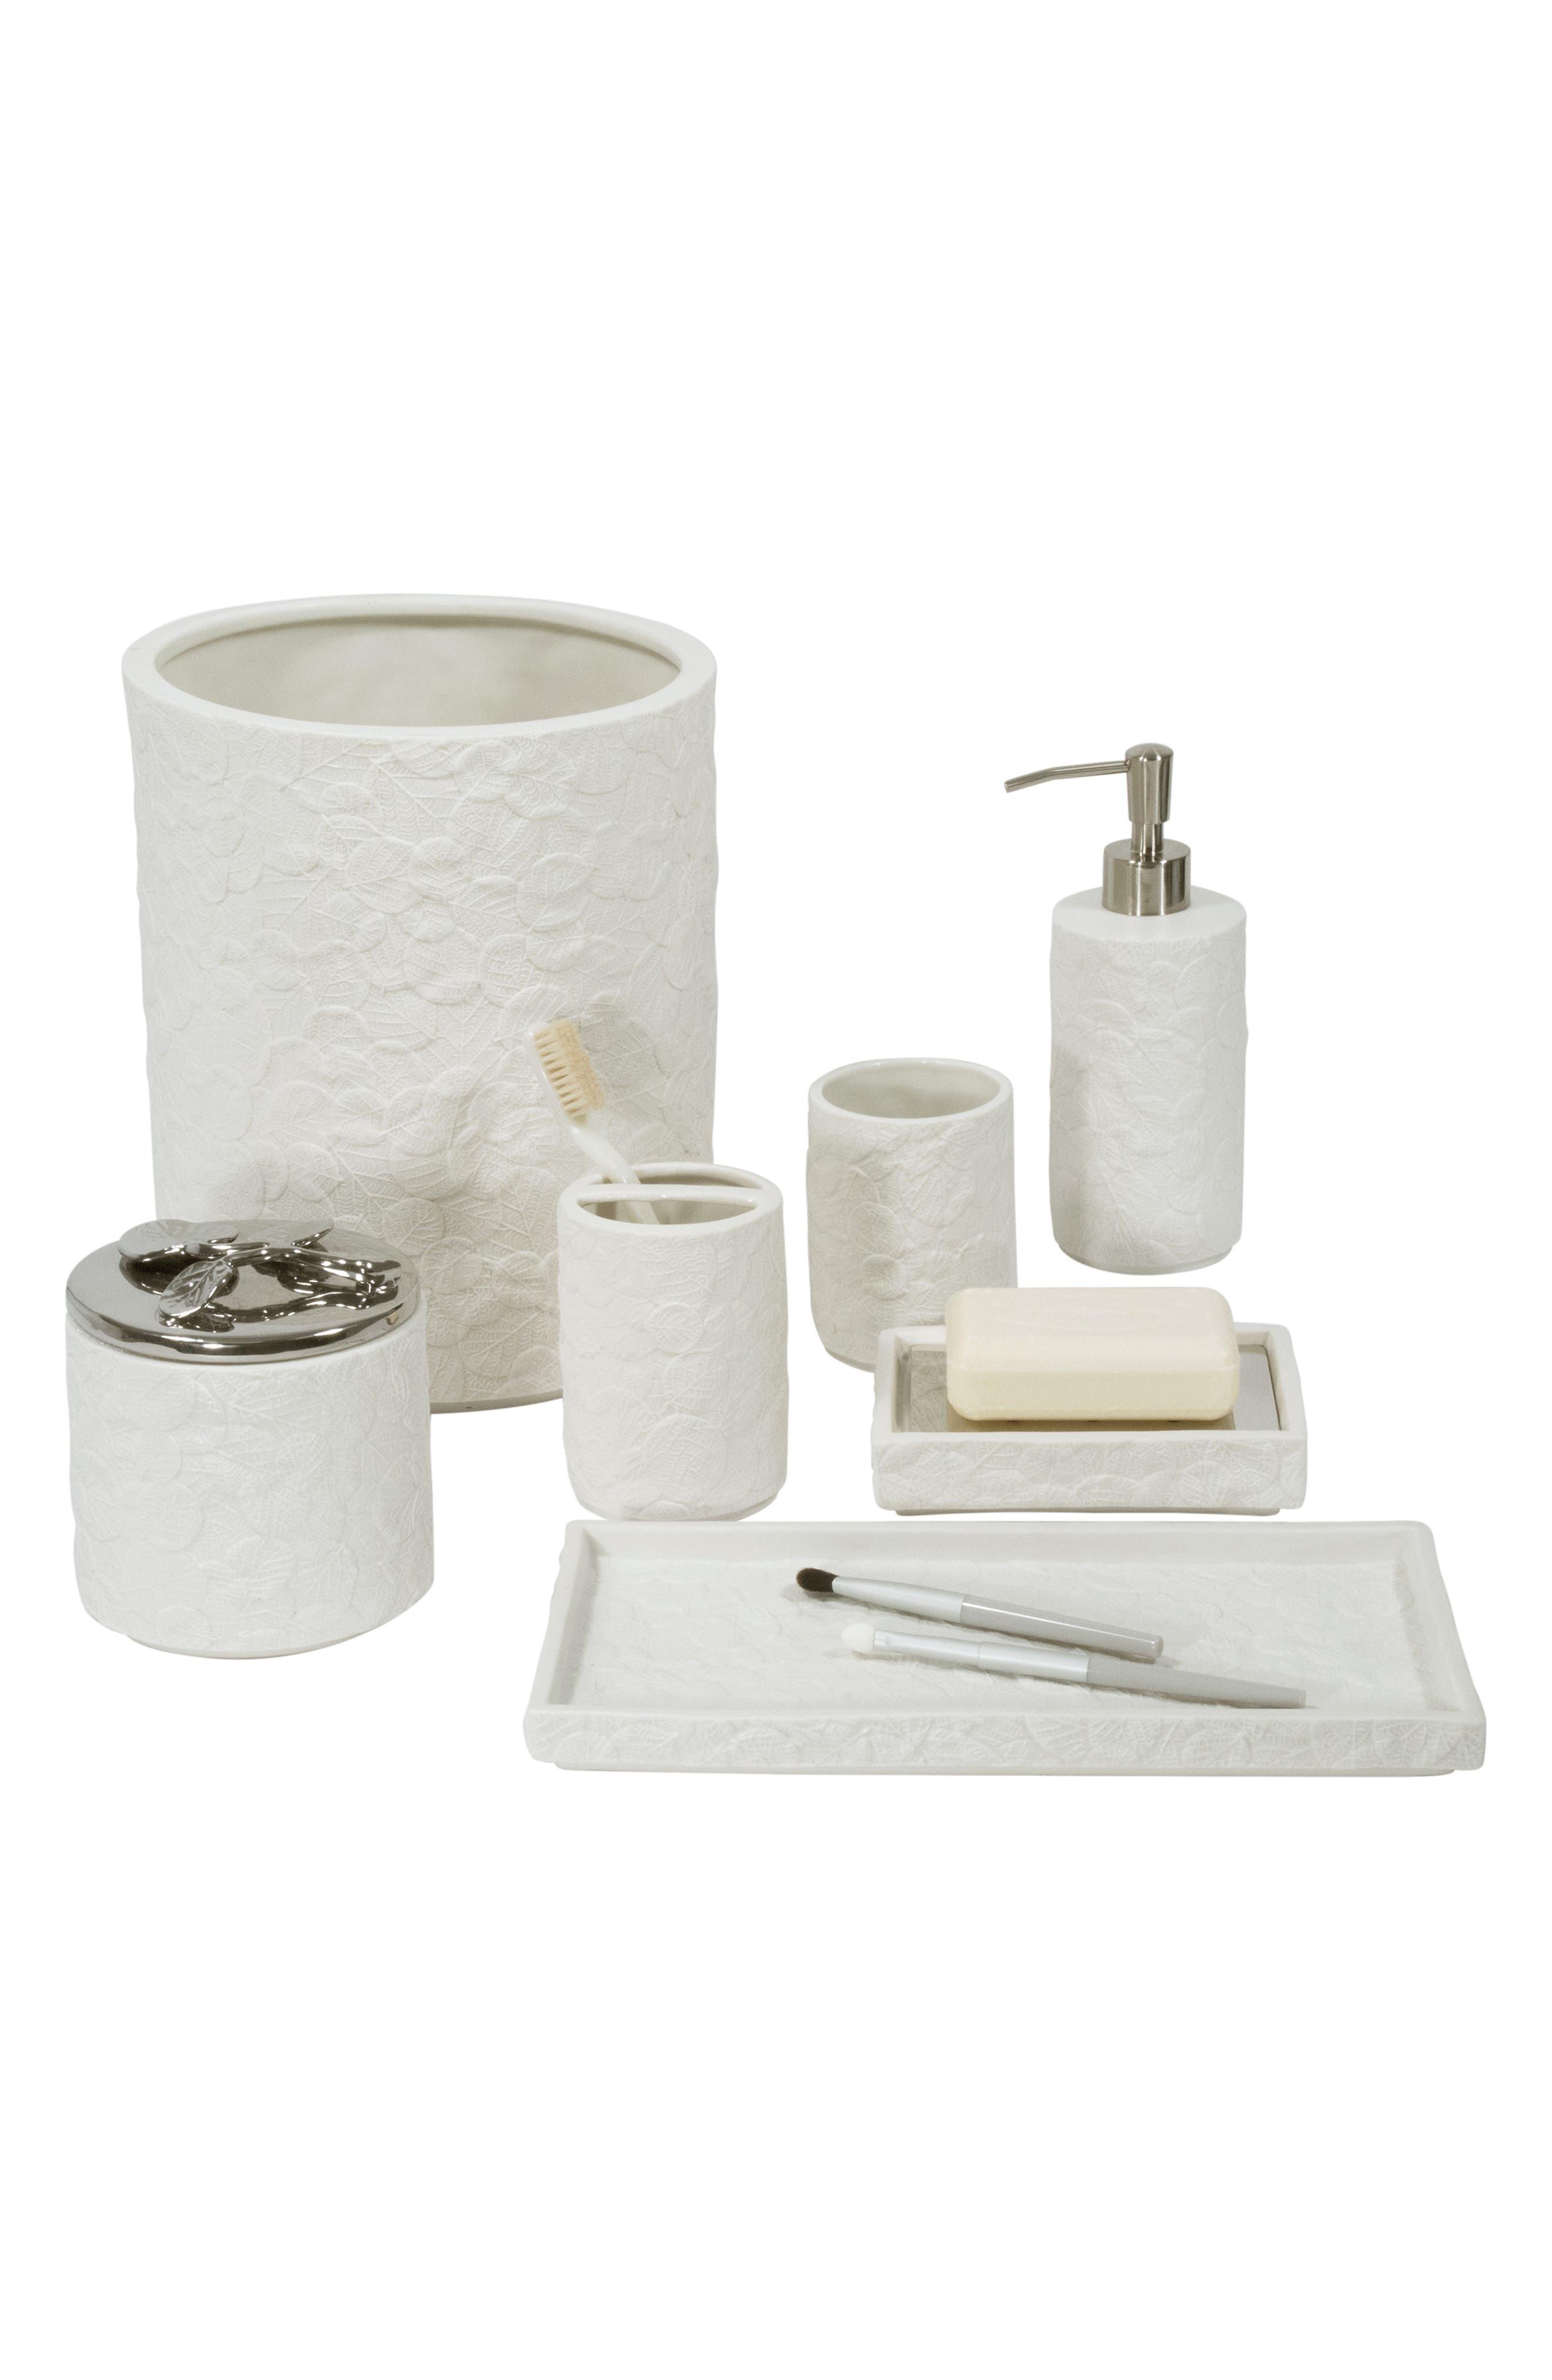 Bathroom Accessories Michael Aram Home Decor & Gifts   Nordstrom